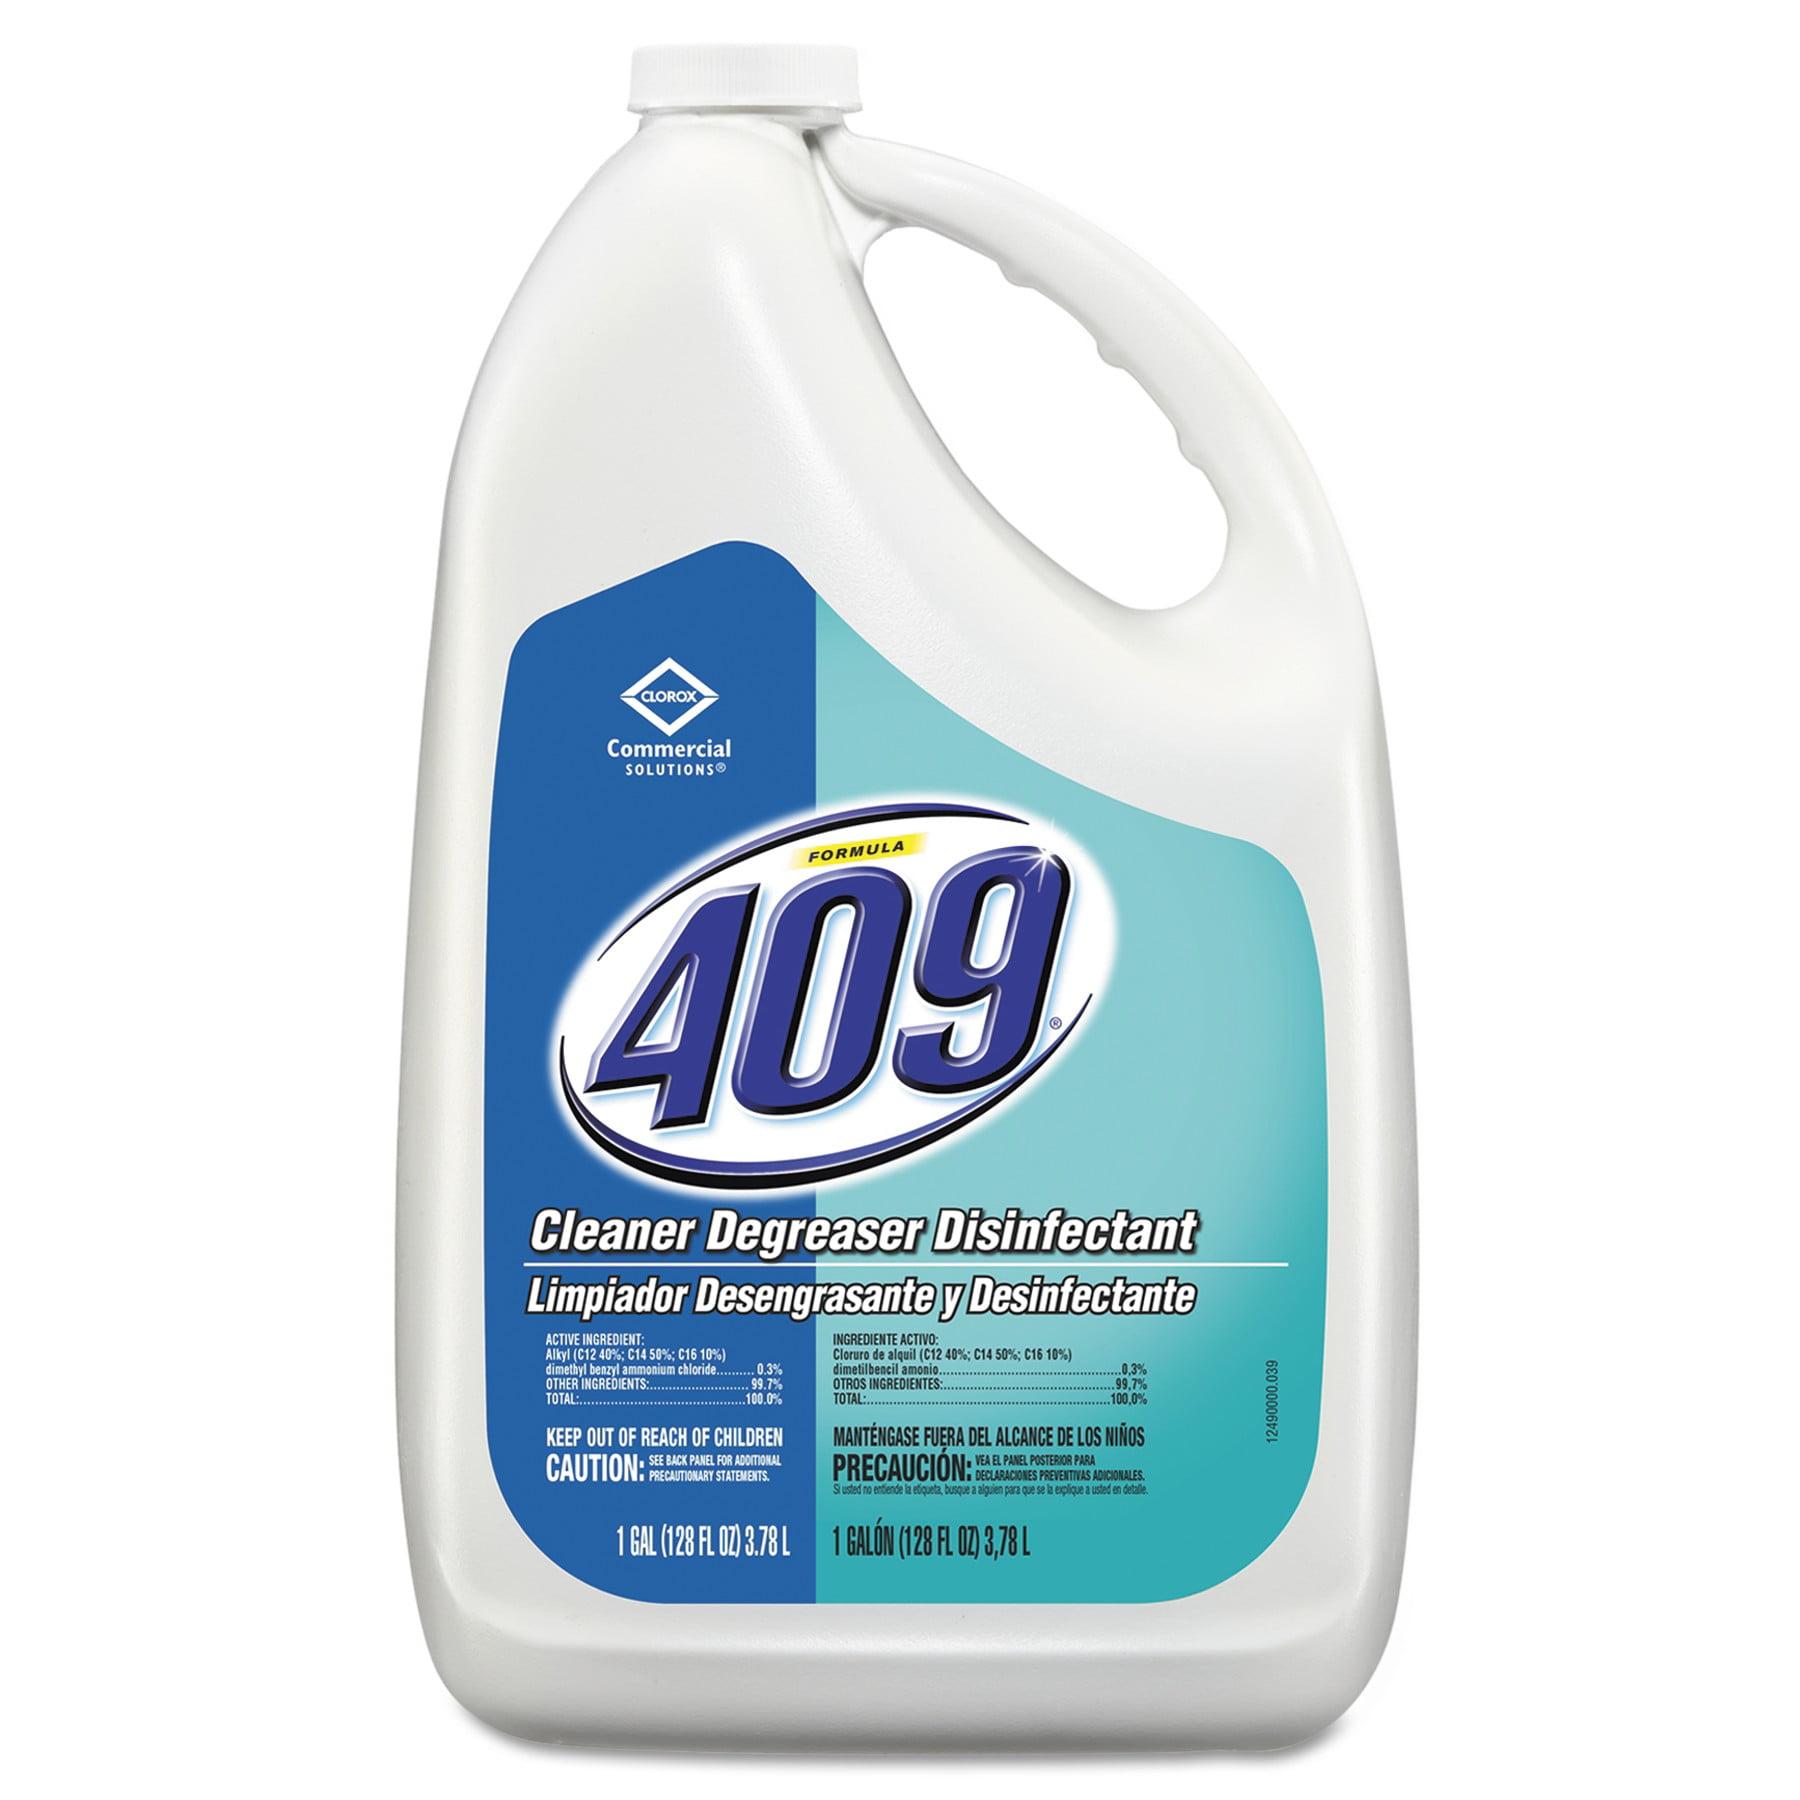 Formula 409 Cleaner Degreaser Disinfectant, Refill, 128 oz - Walmart.com